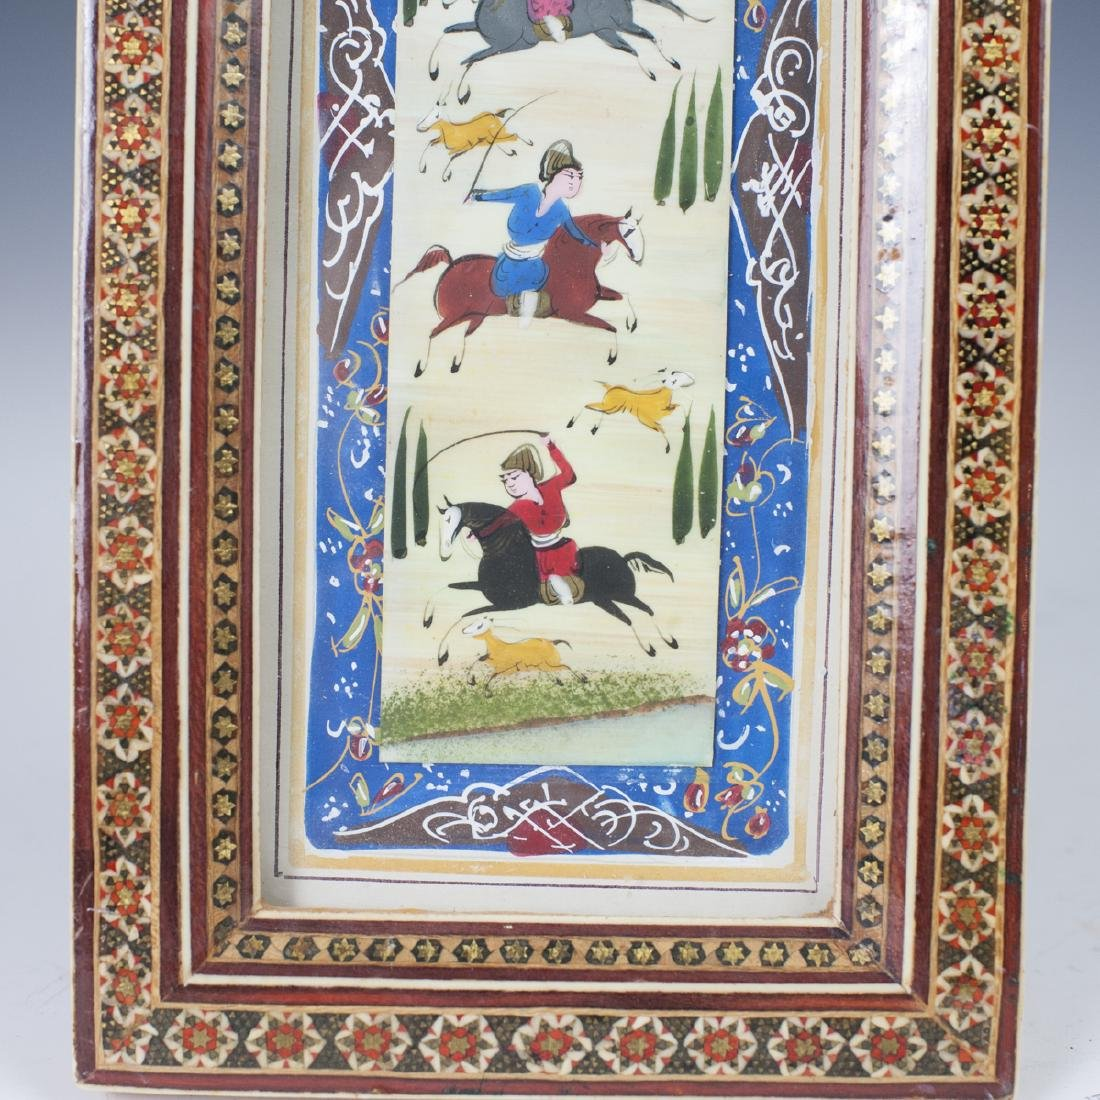 Persian Miniature Painting on Bone - 3